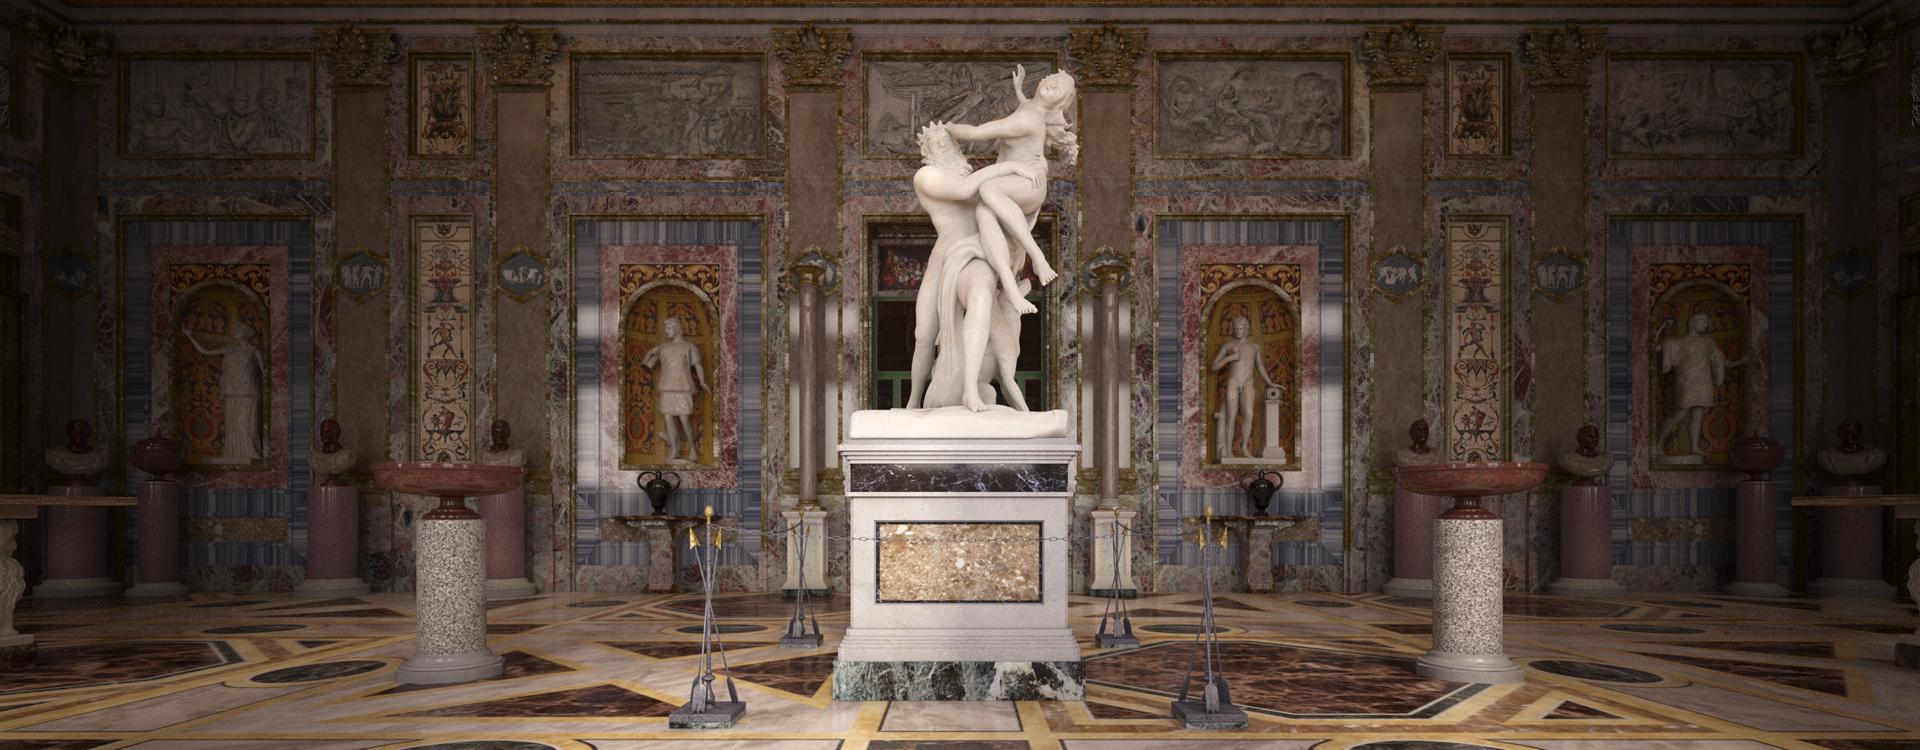 Galleria Borghese-01_1.jpg